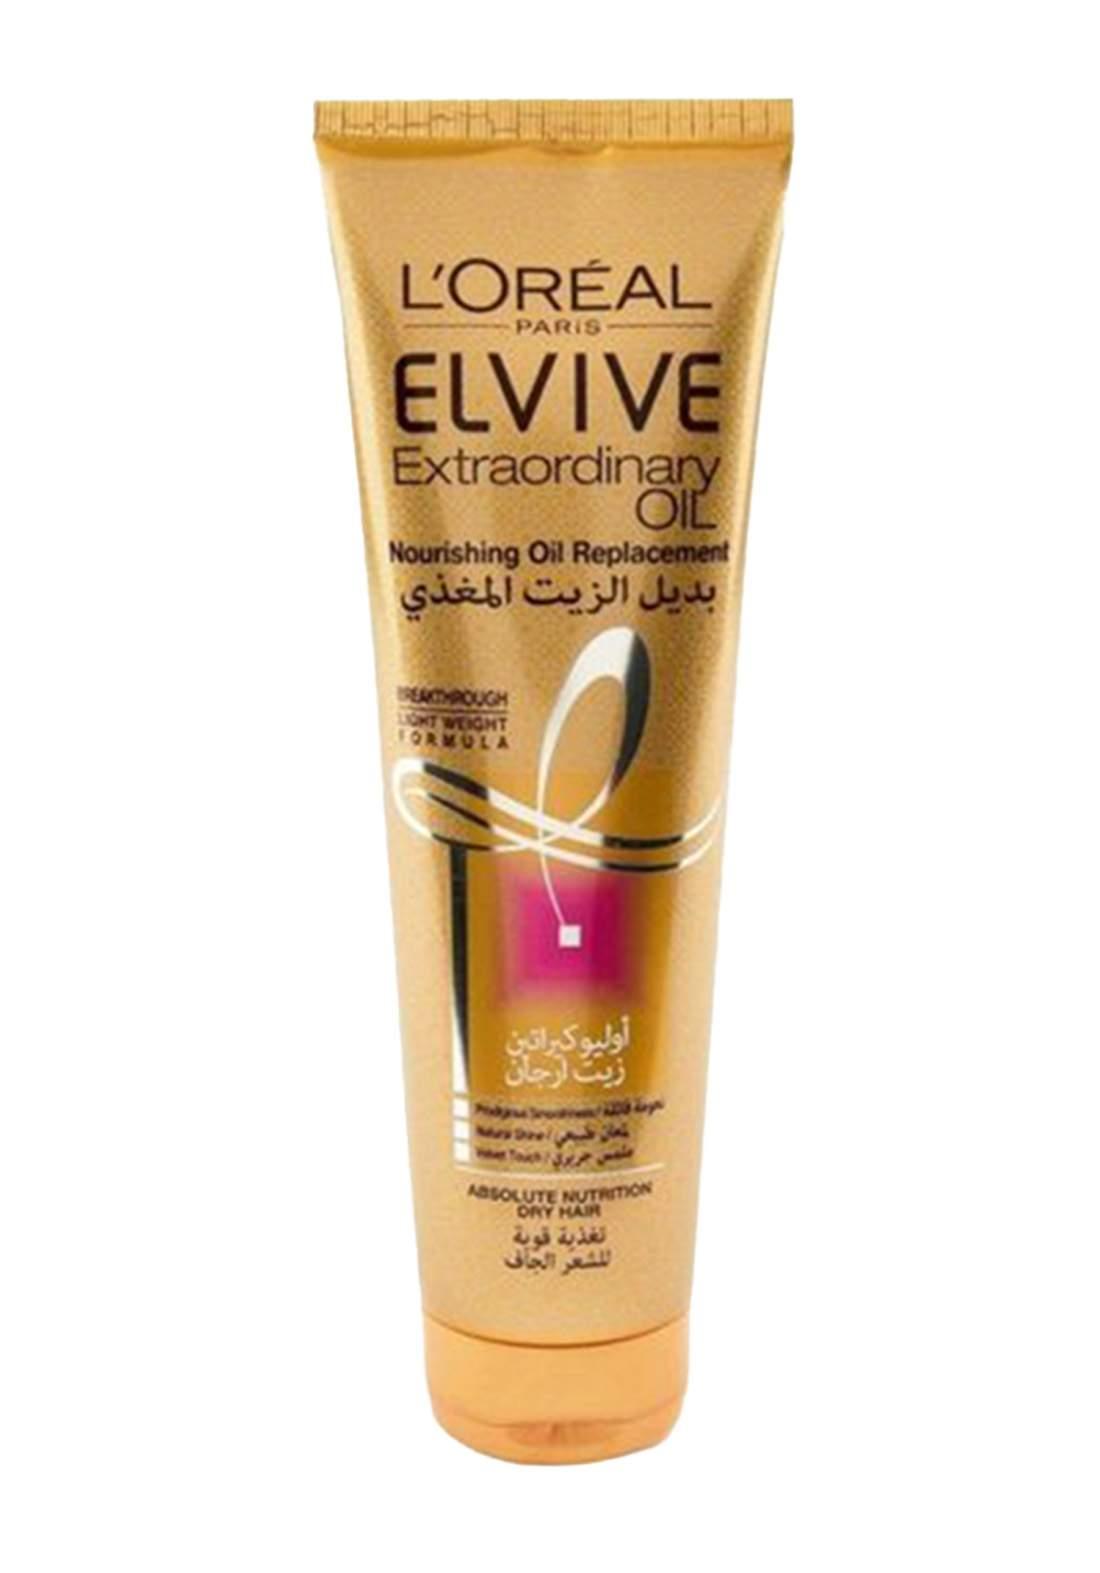 L'Oreal Elvive Extra ordinary oil replacement 300 ml بديل الزيت الأستثنائي